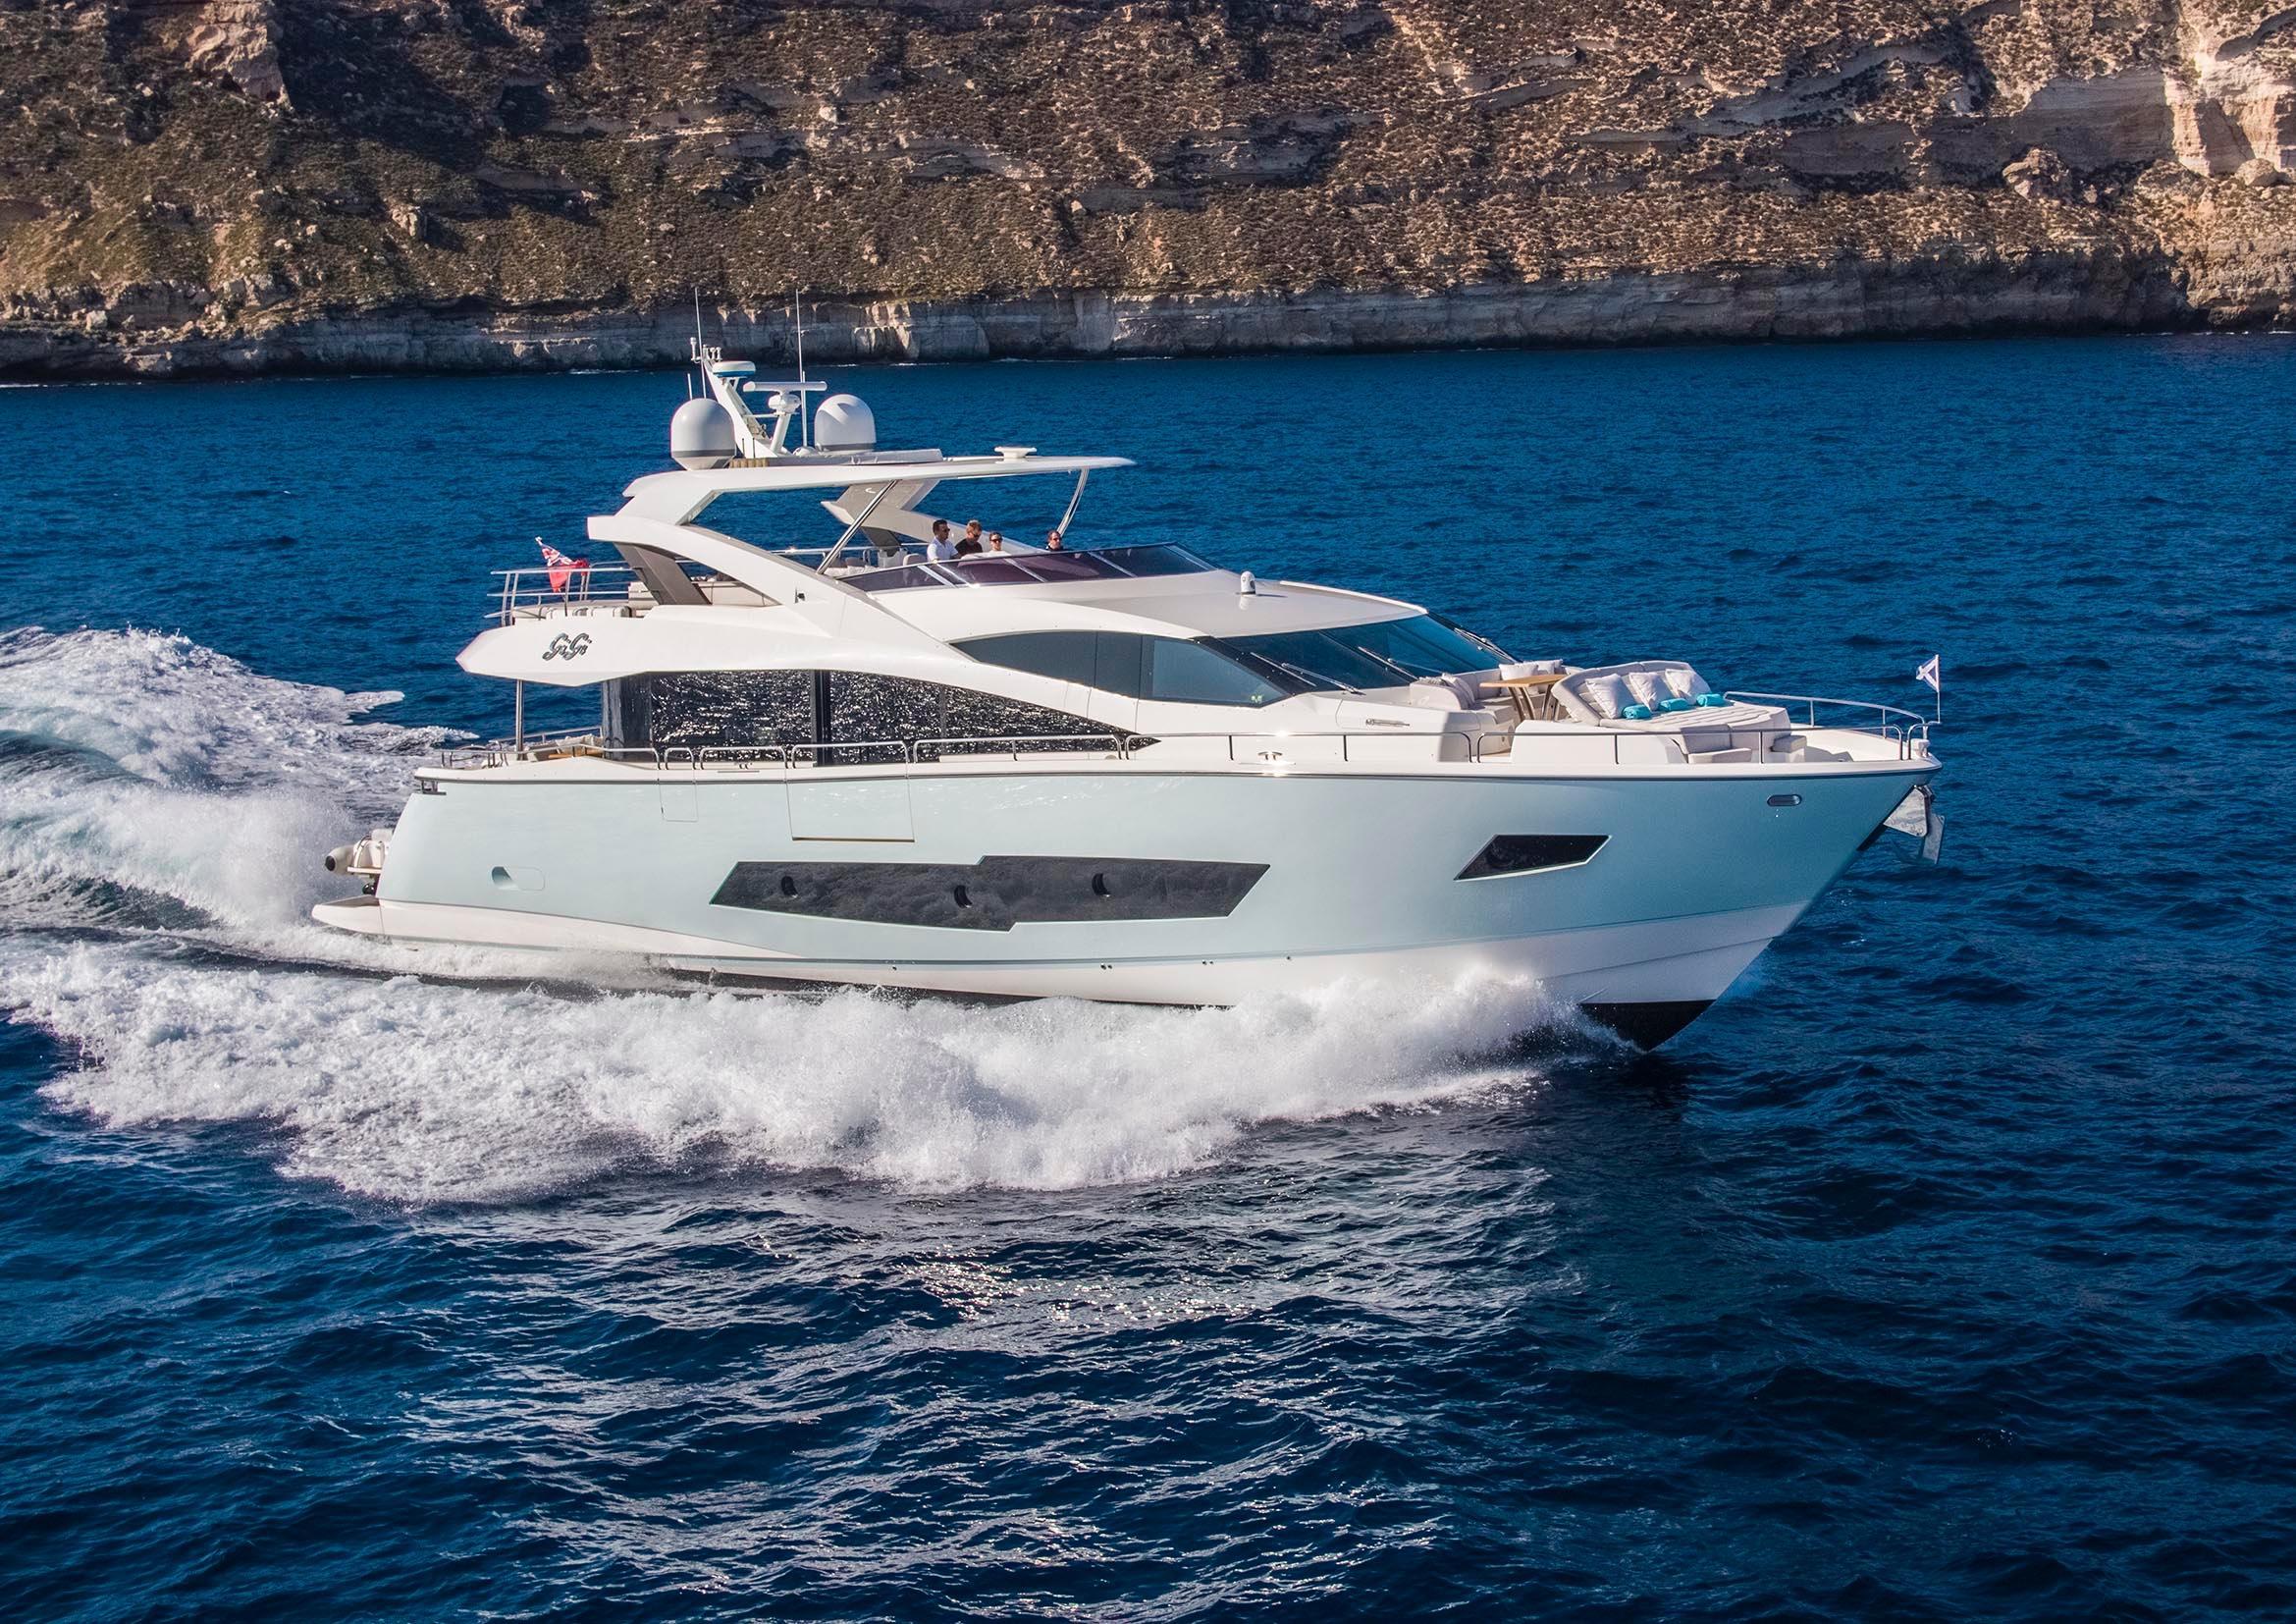 Fußboden Yacht ~ Sunseeker yacht power boat for sale yachtworld